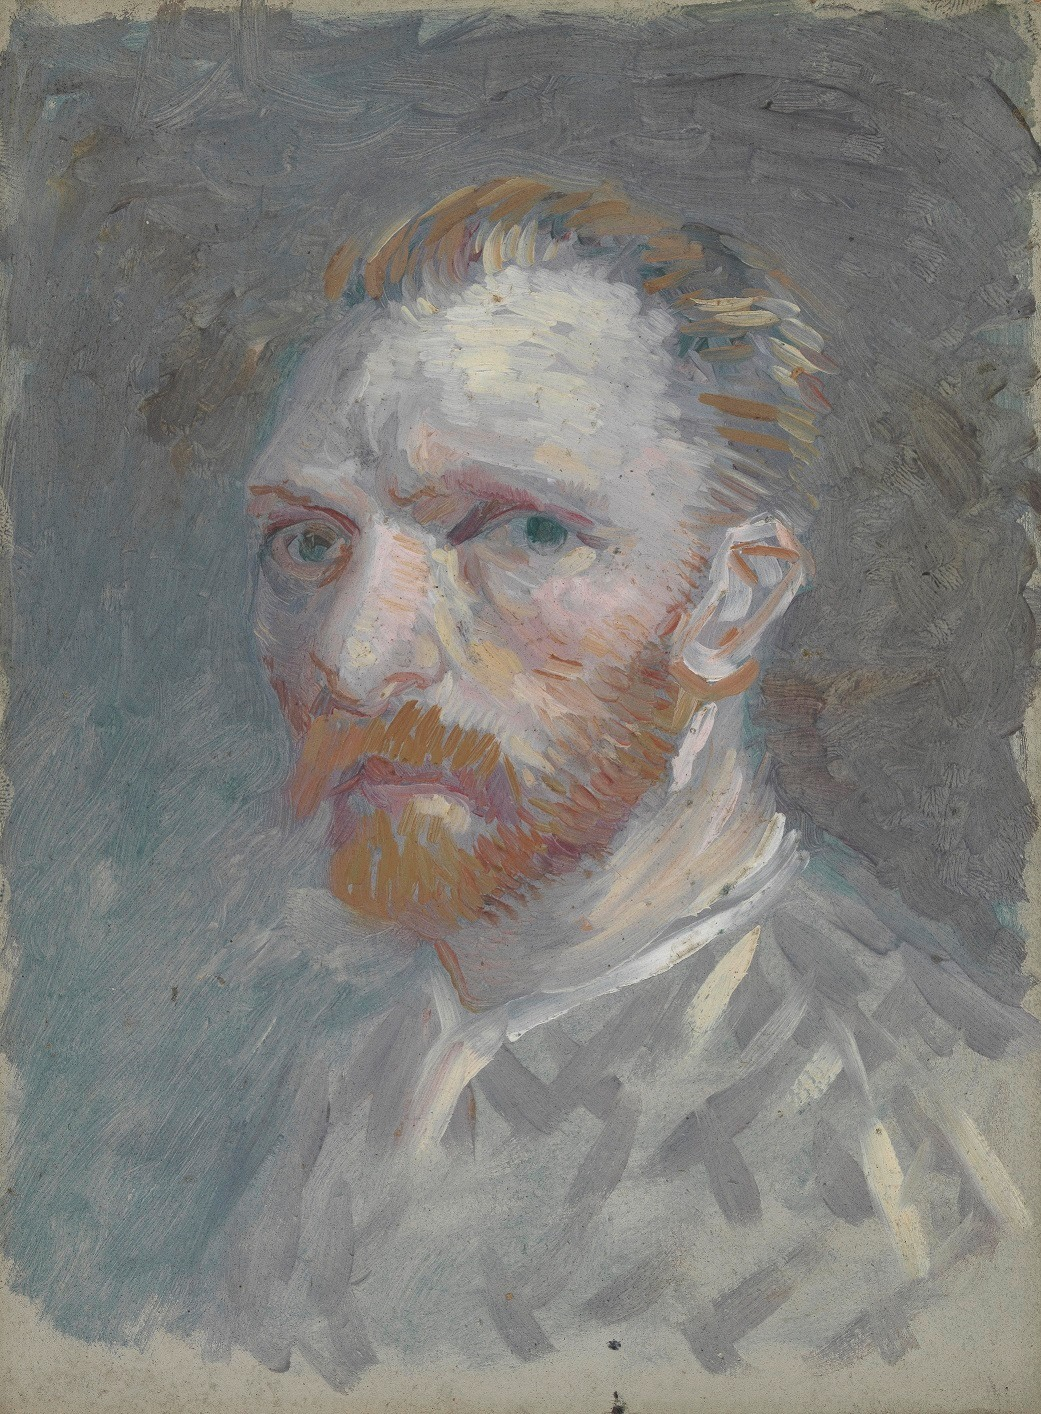 Van Gogh, Self-Portrait, March-June 1887. Oil on cardboard, 19.1 x 14.1 cm. Van Gogh Museum, Amsterdam.